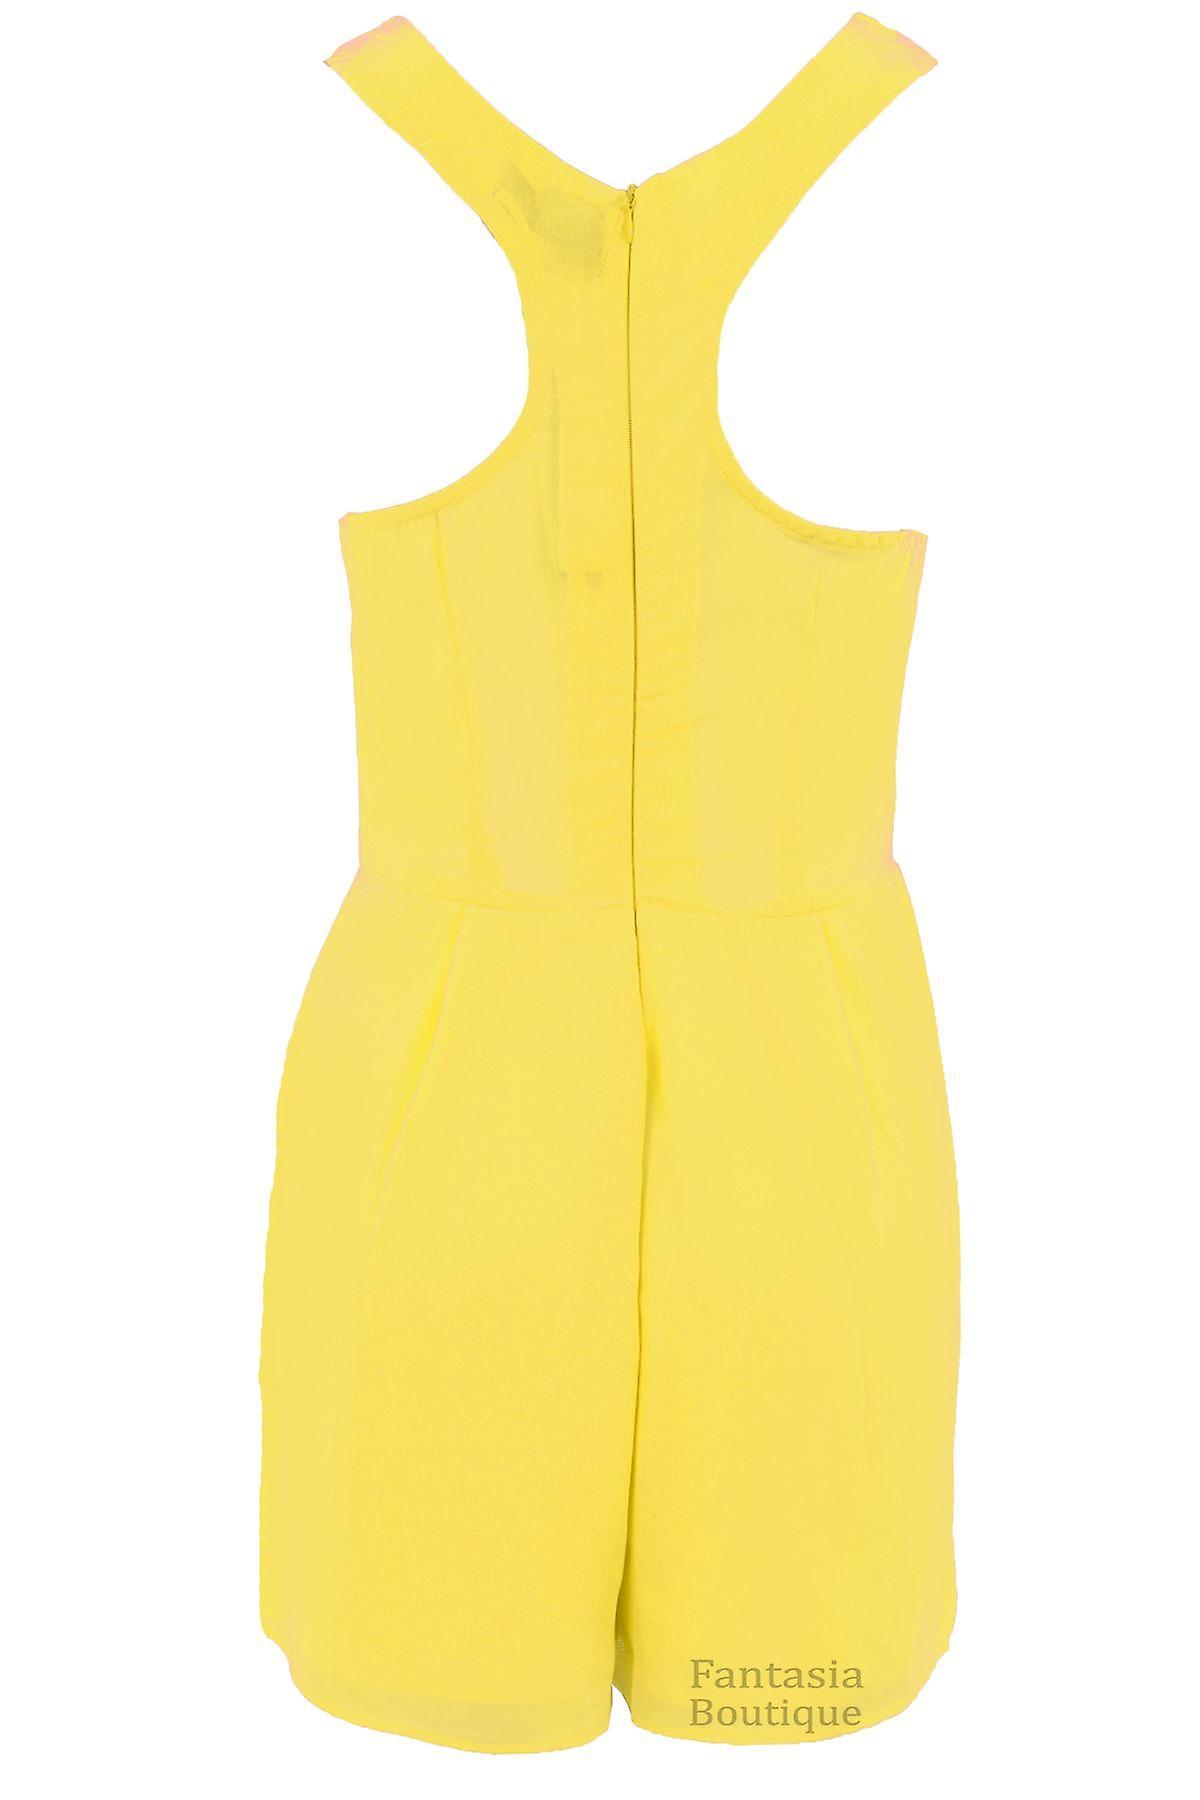 Ladies Sleeveless Racer Back Chiffon Lined V Neck Zip Back Party Shorts Playsuit